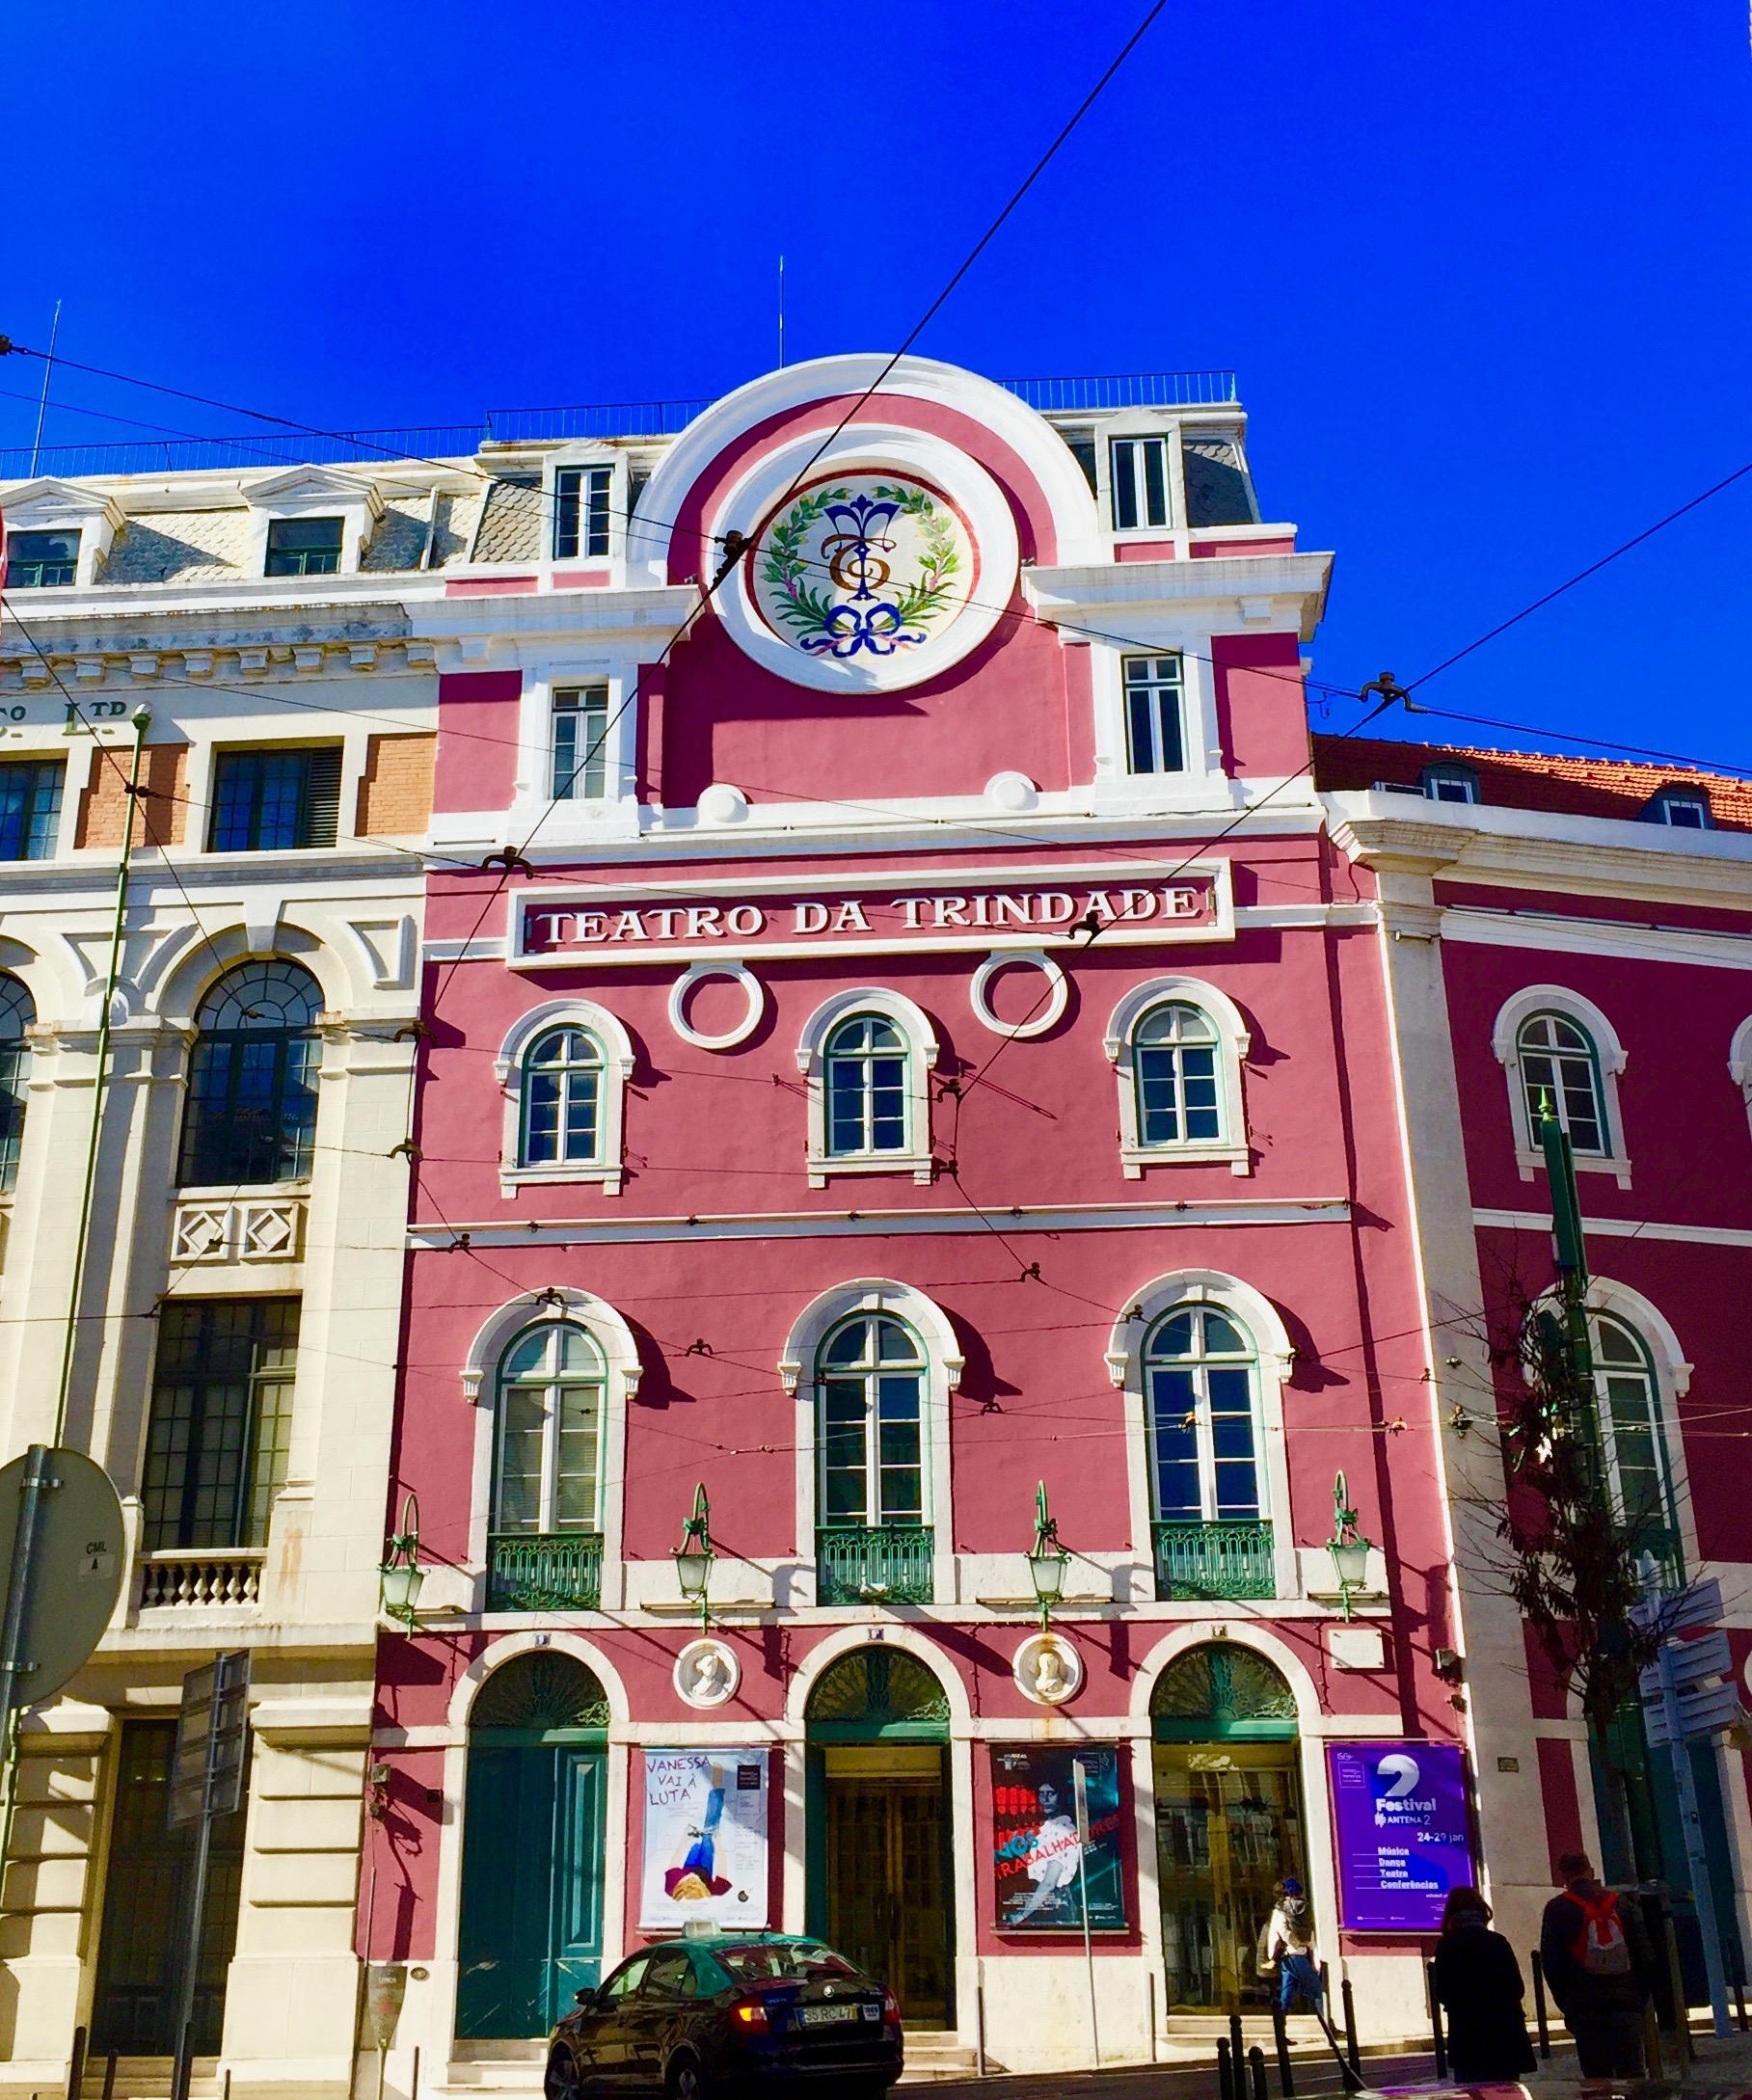 barrio_alto_lisbon_portugal_lustforthesublime